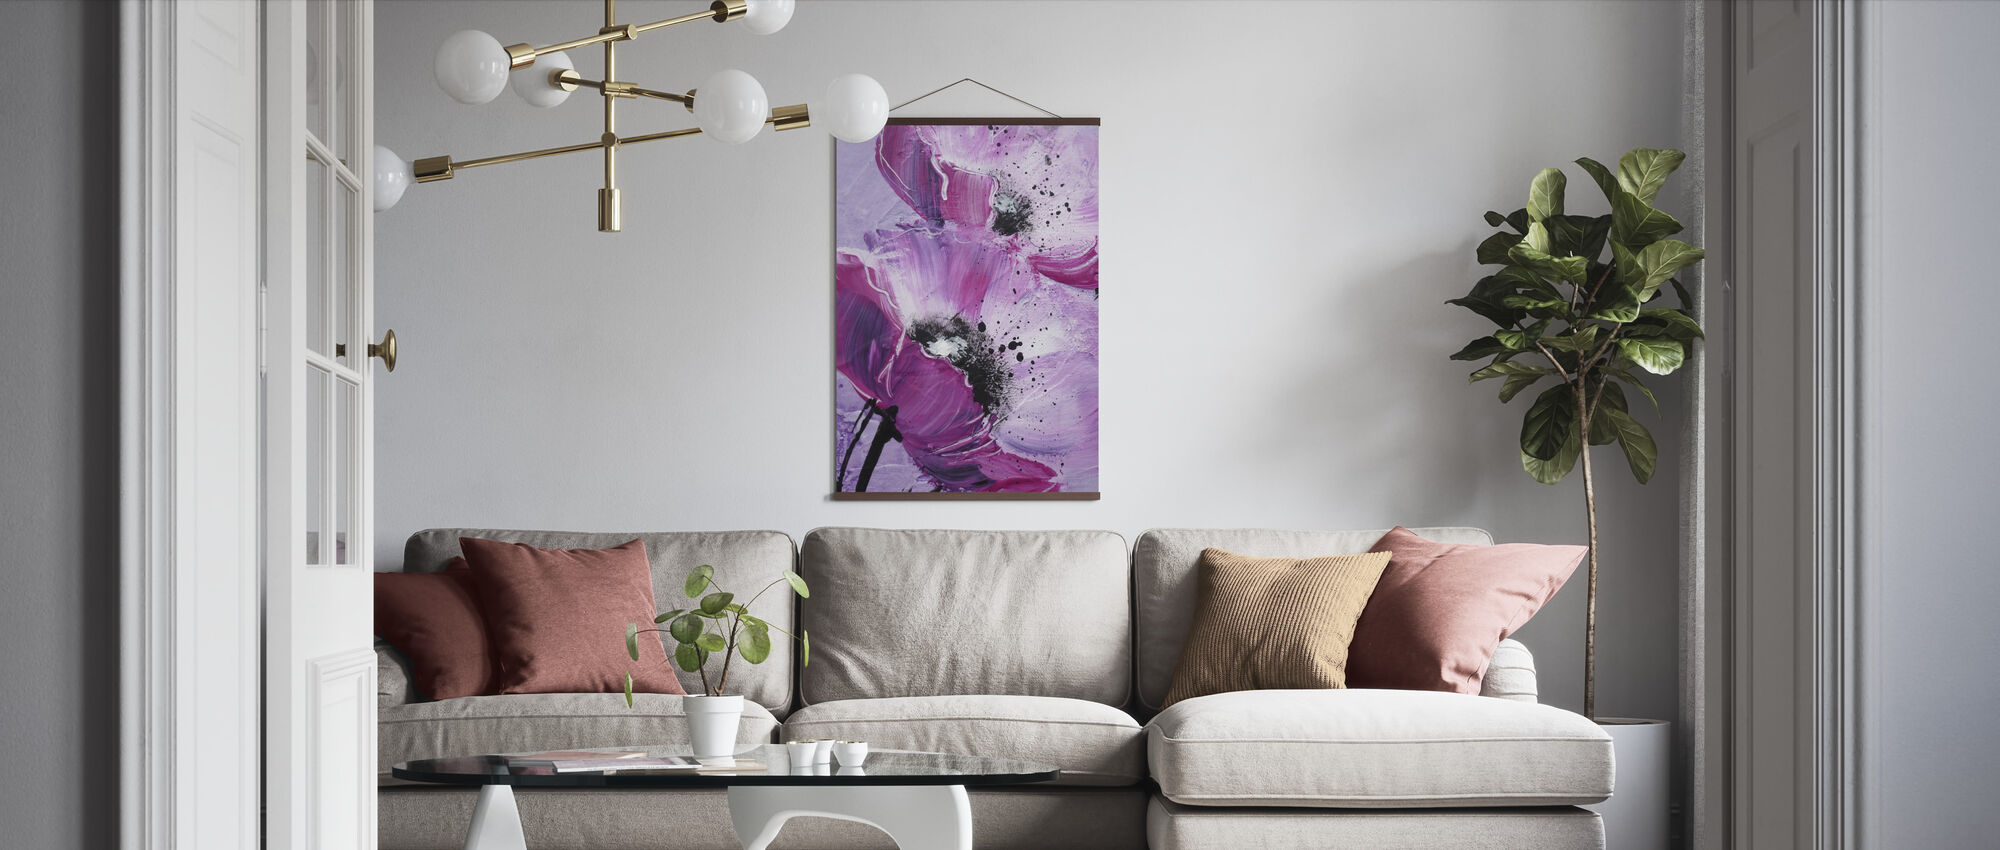 Violet Poppy Harmony - Poster - Living Room